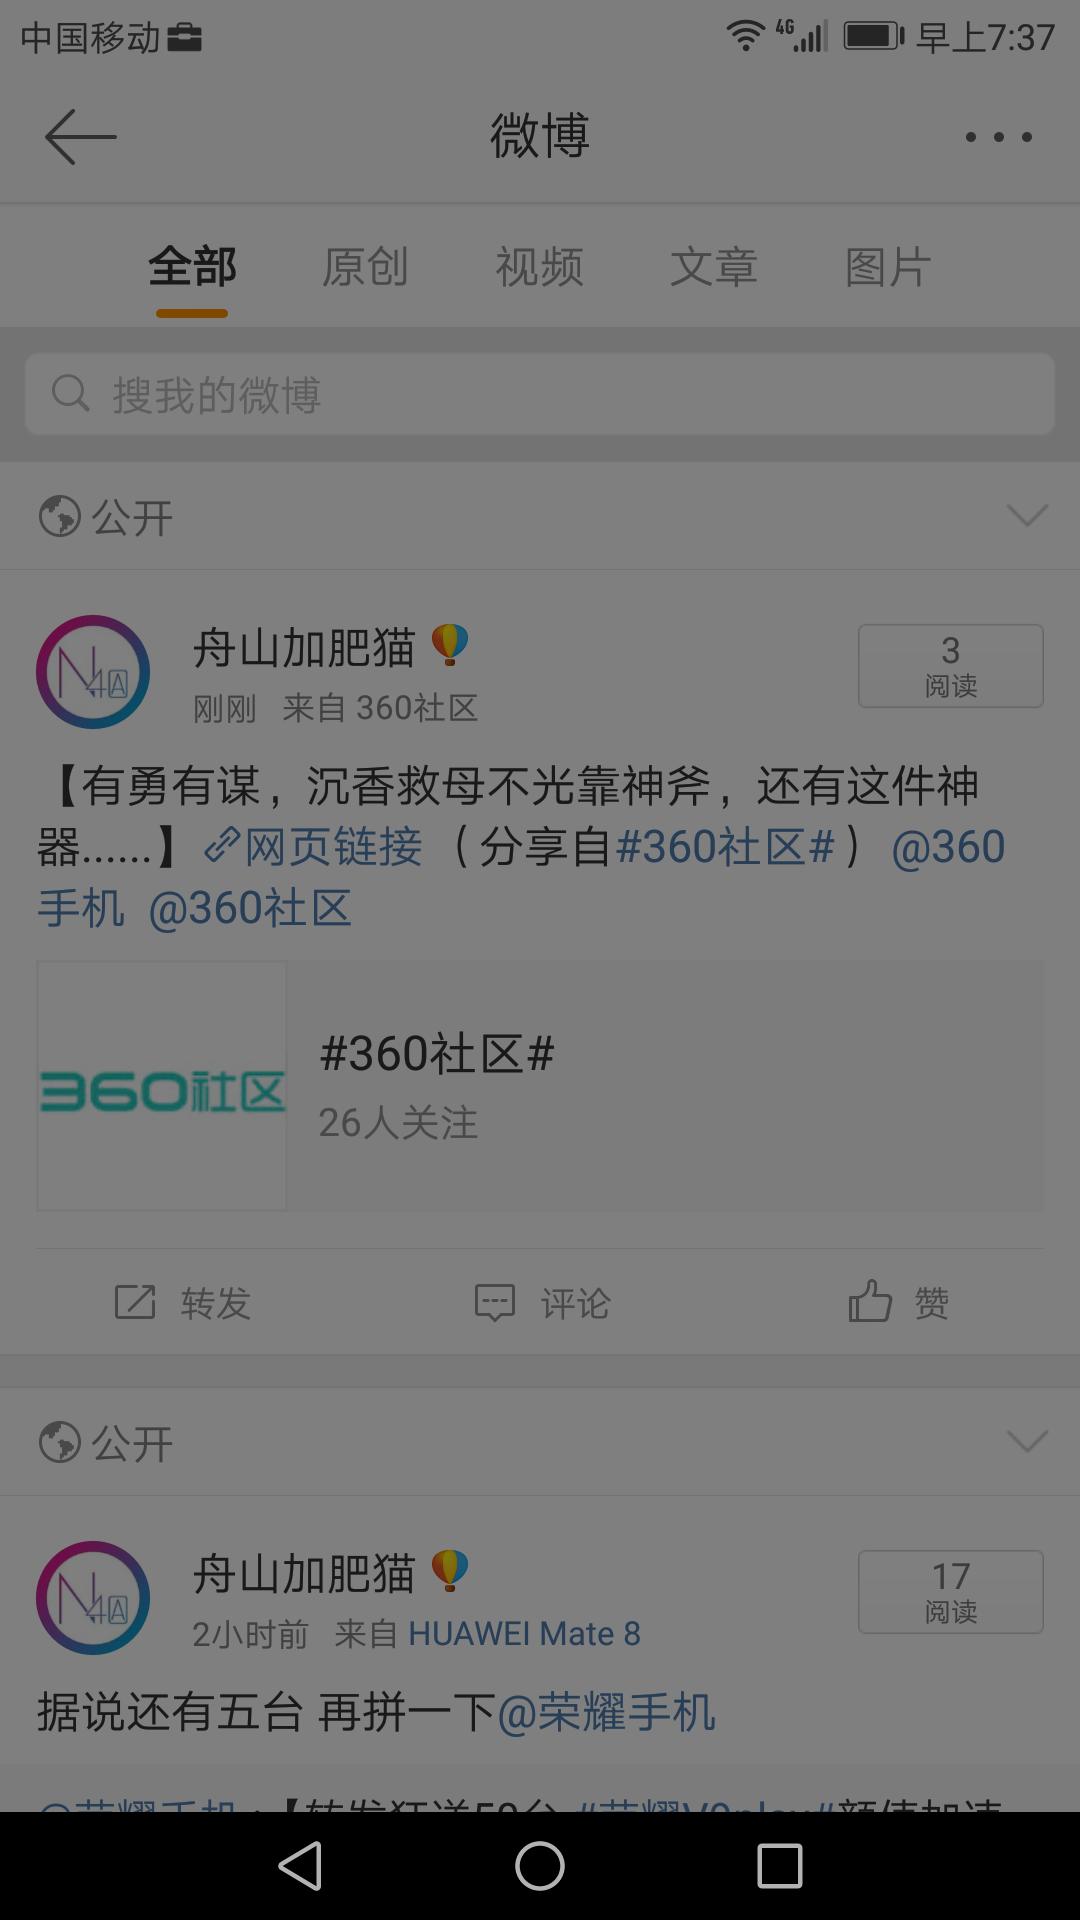 Screenshot_20170912-073729.png